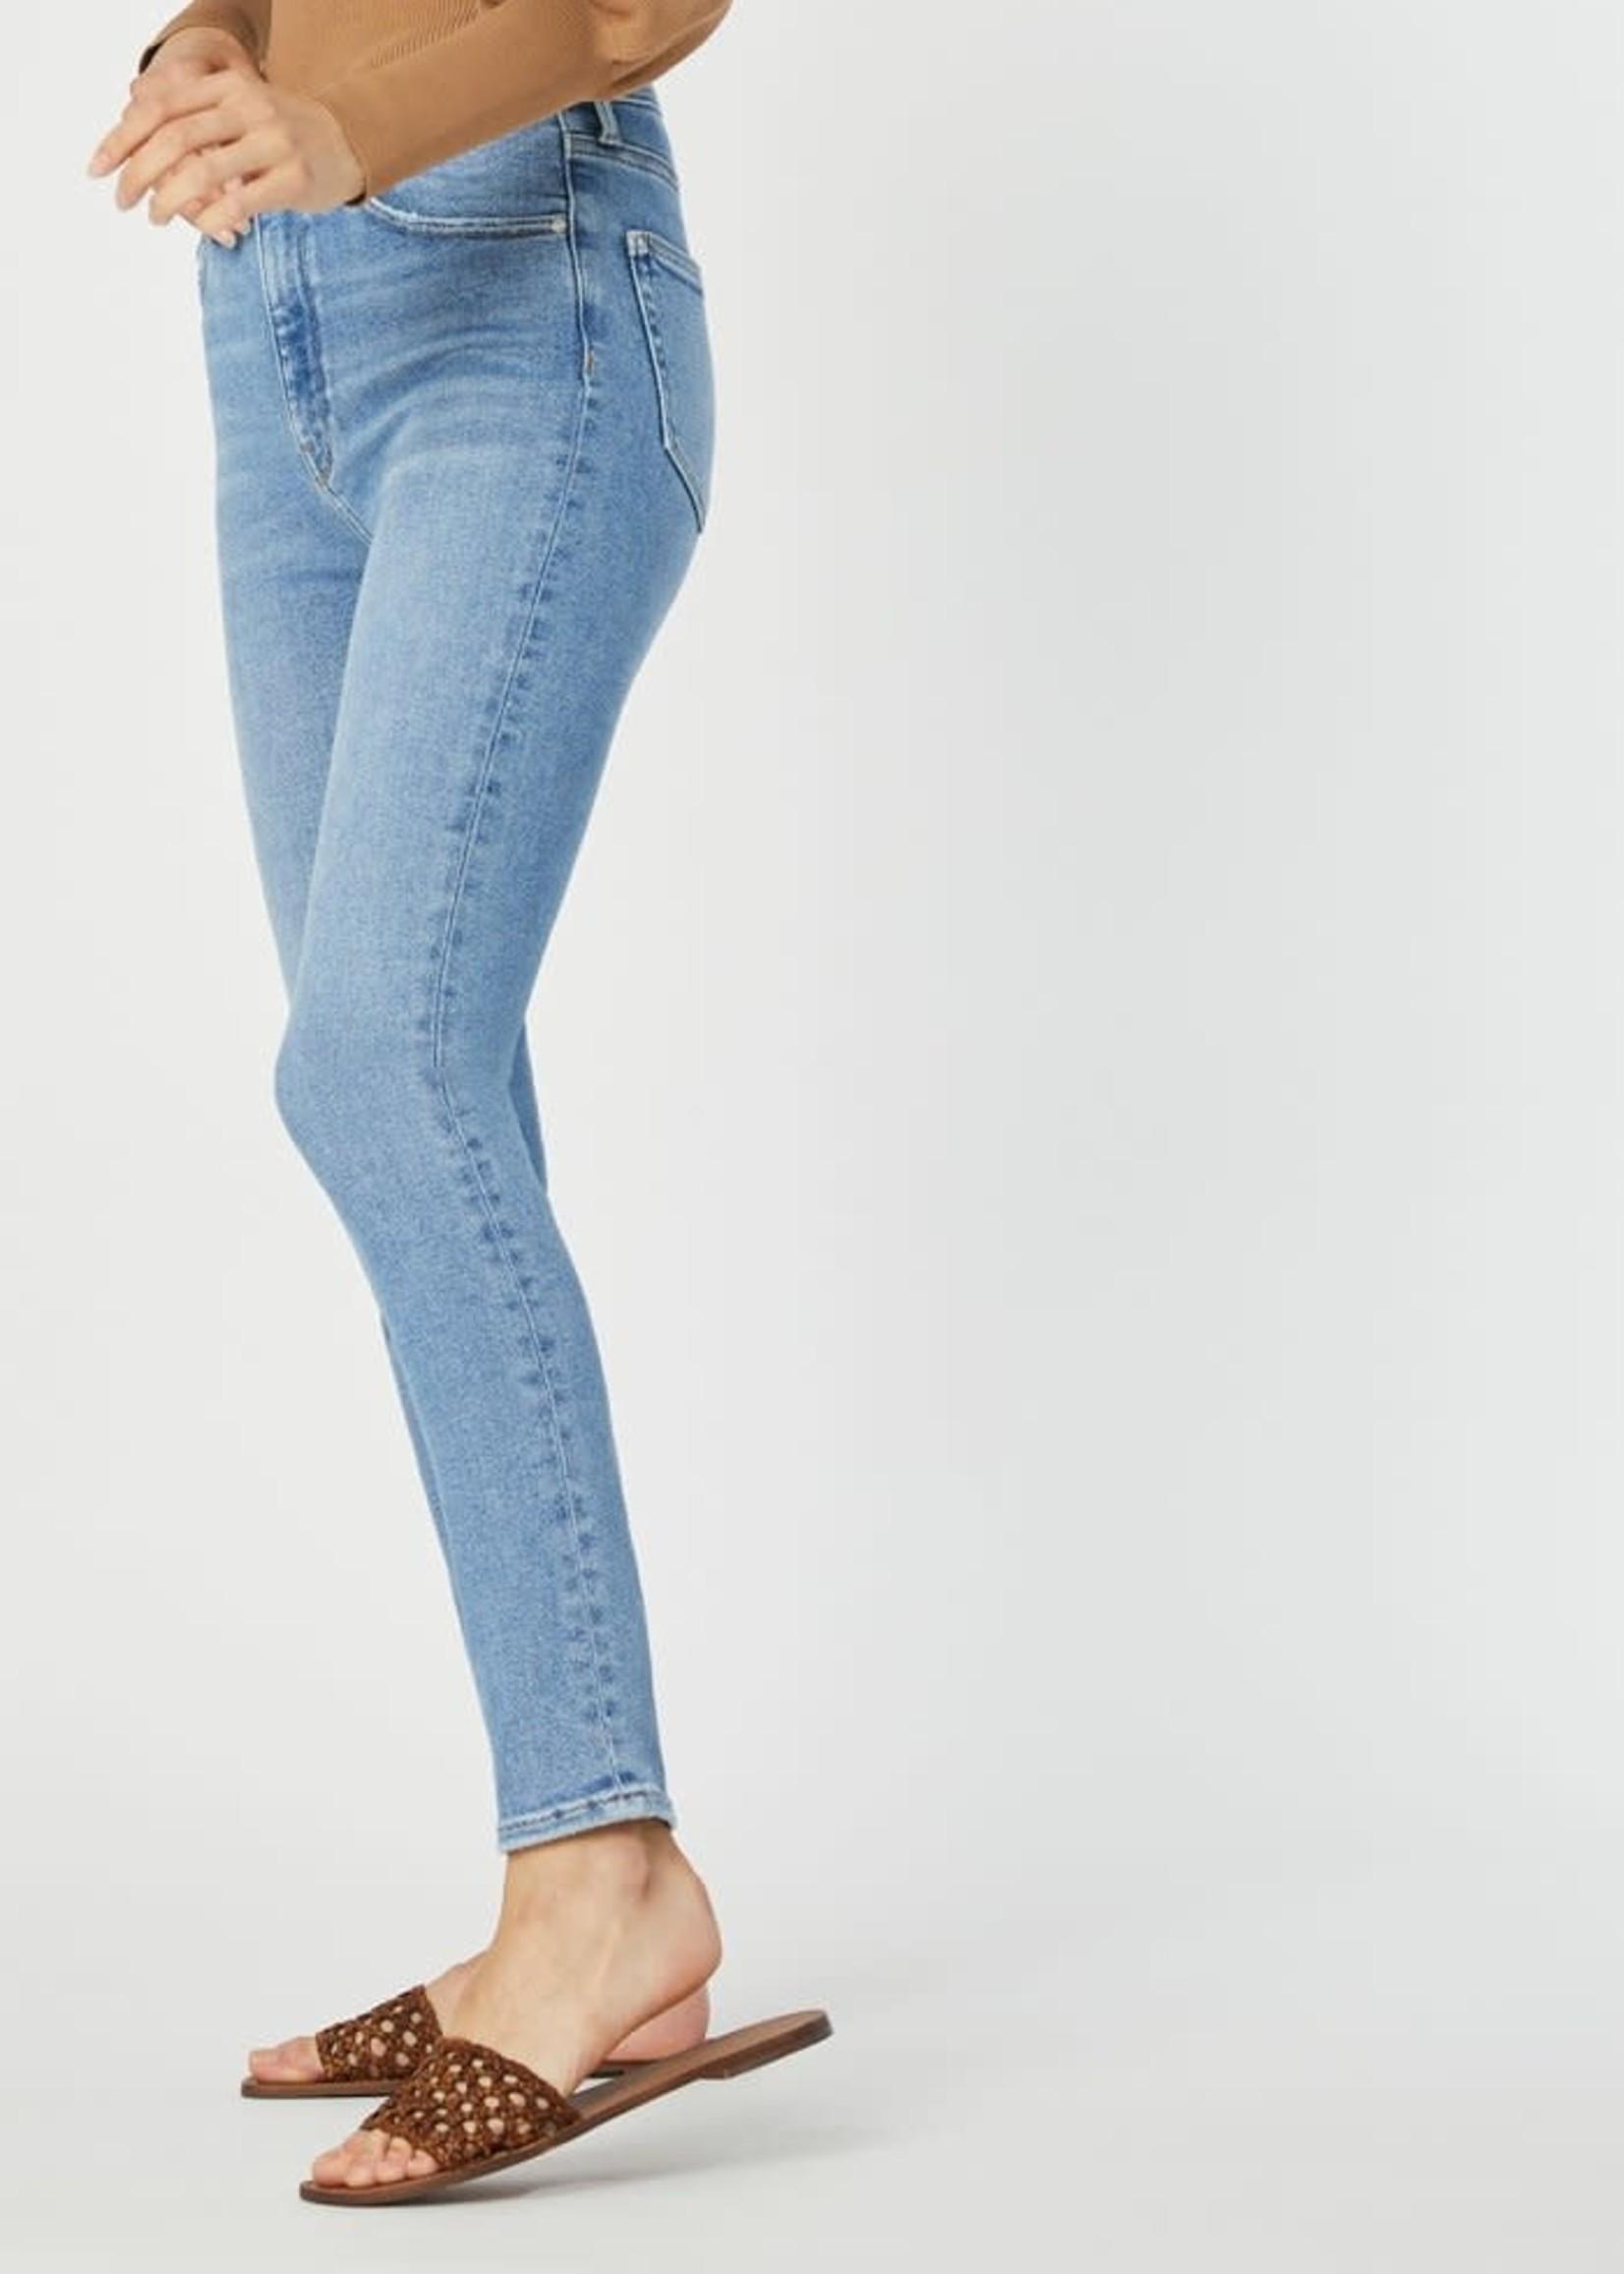 "MAVI Jeans SCARLETT denim, LA Vintage, 29"" length"